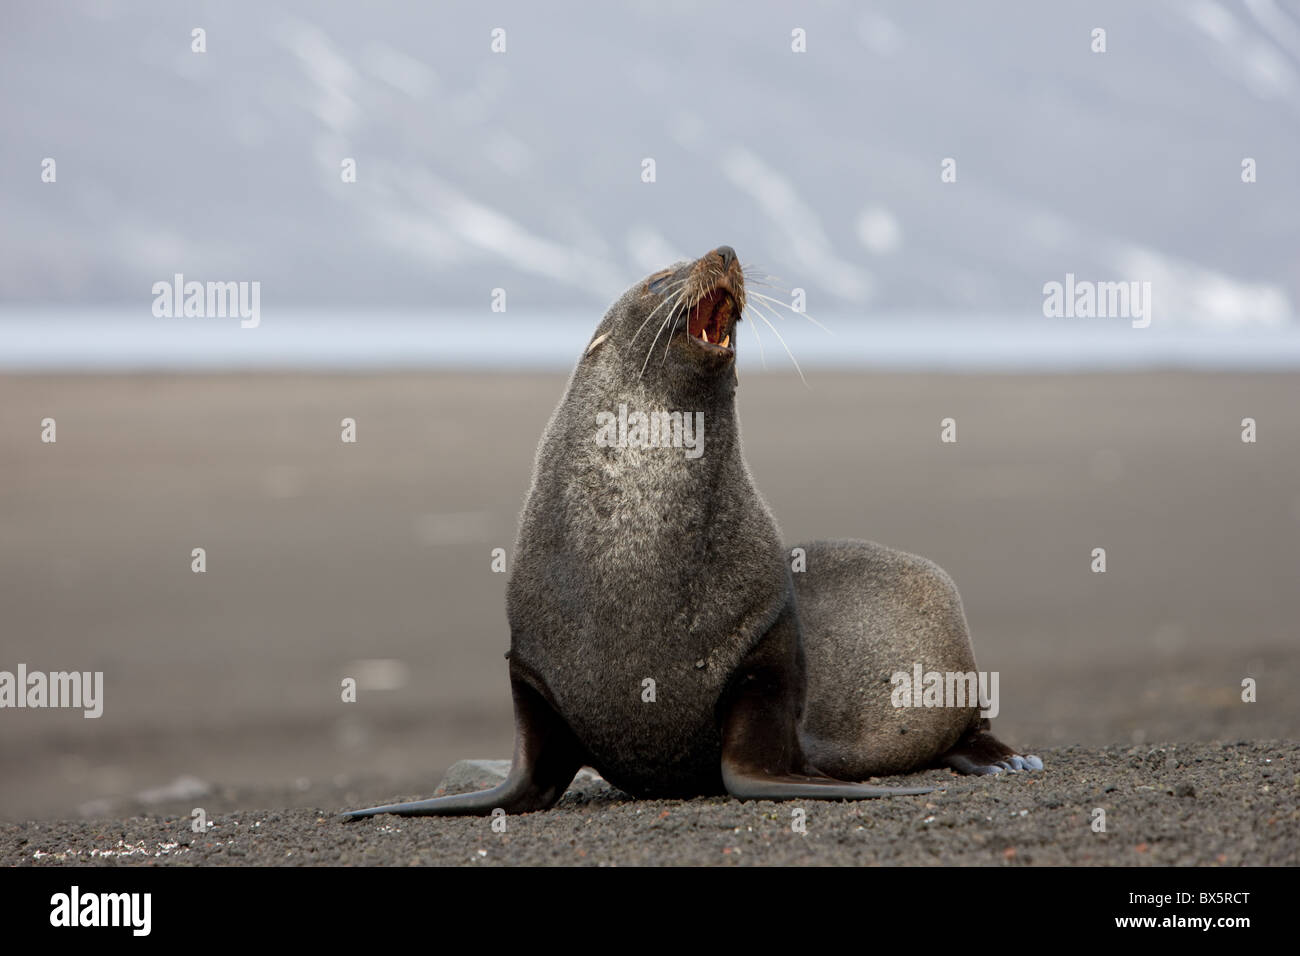 Antarctic fur seal (Arctocephalus gazella), Deception Island, South Shetlands, Antarctic, Polar Regions - Stock Image